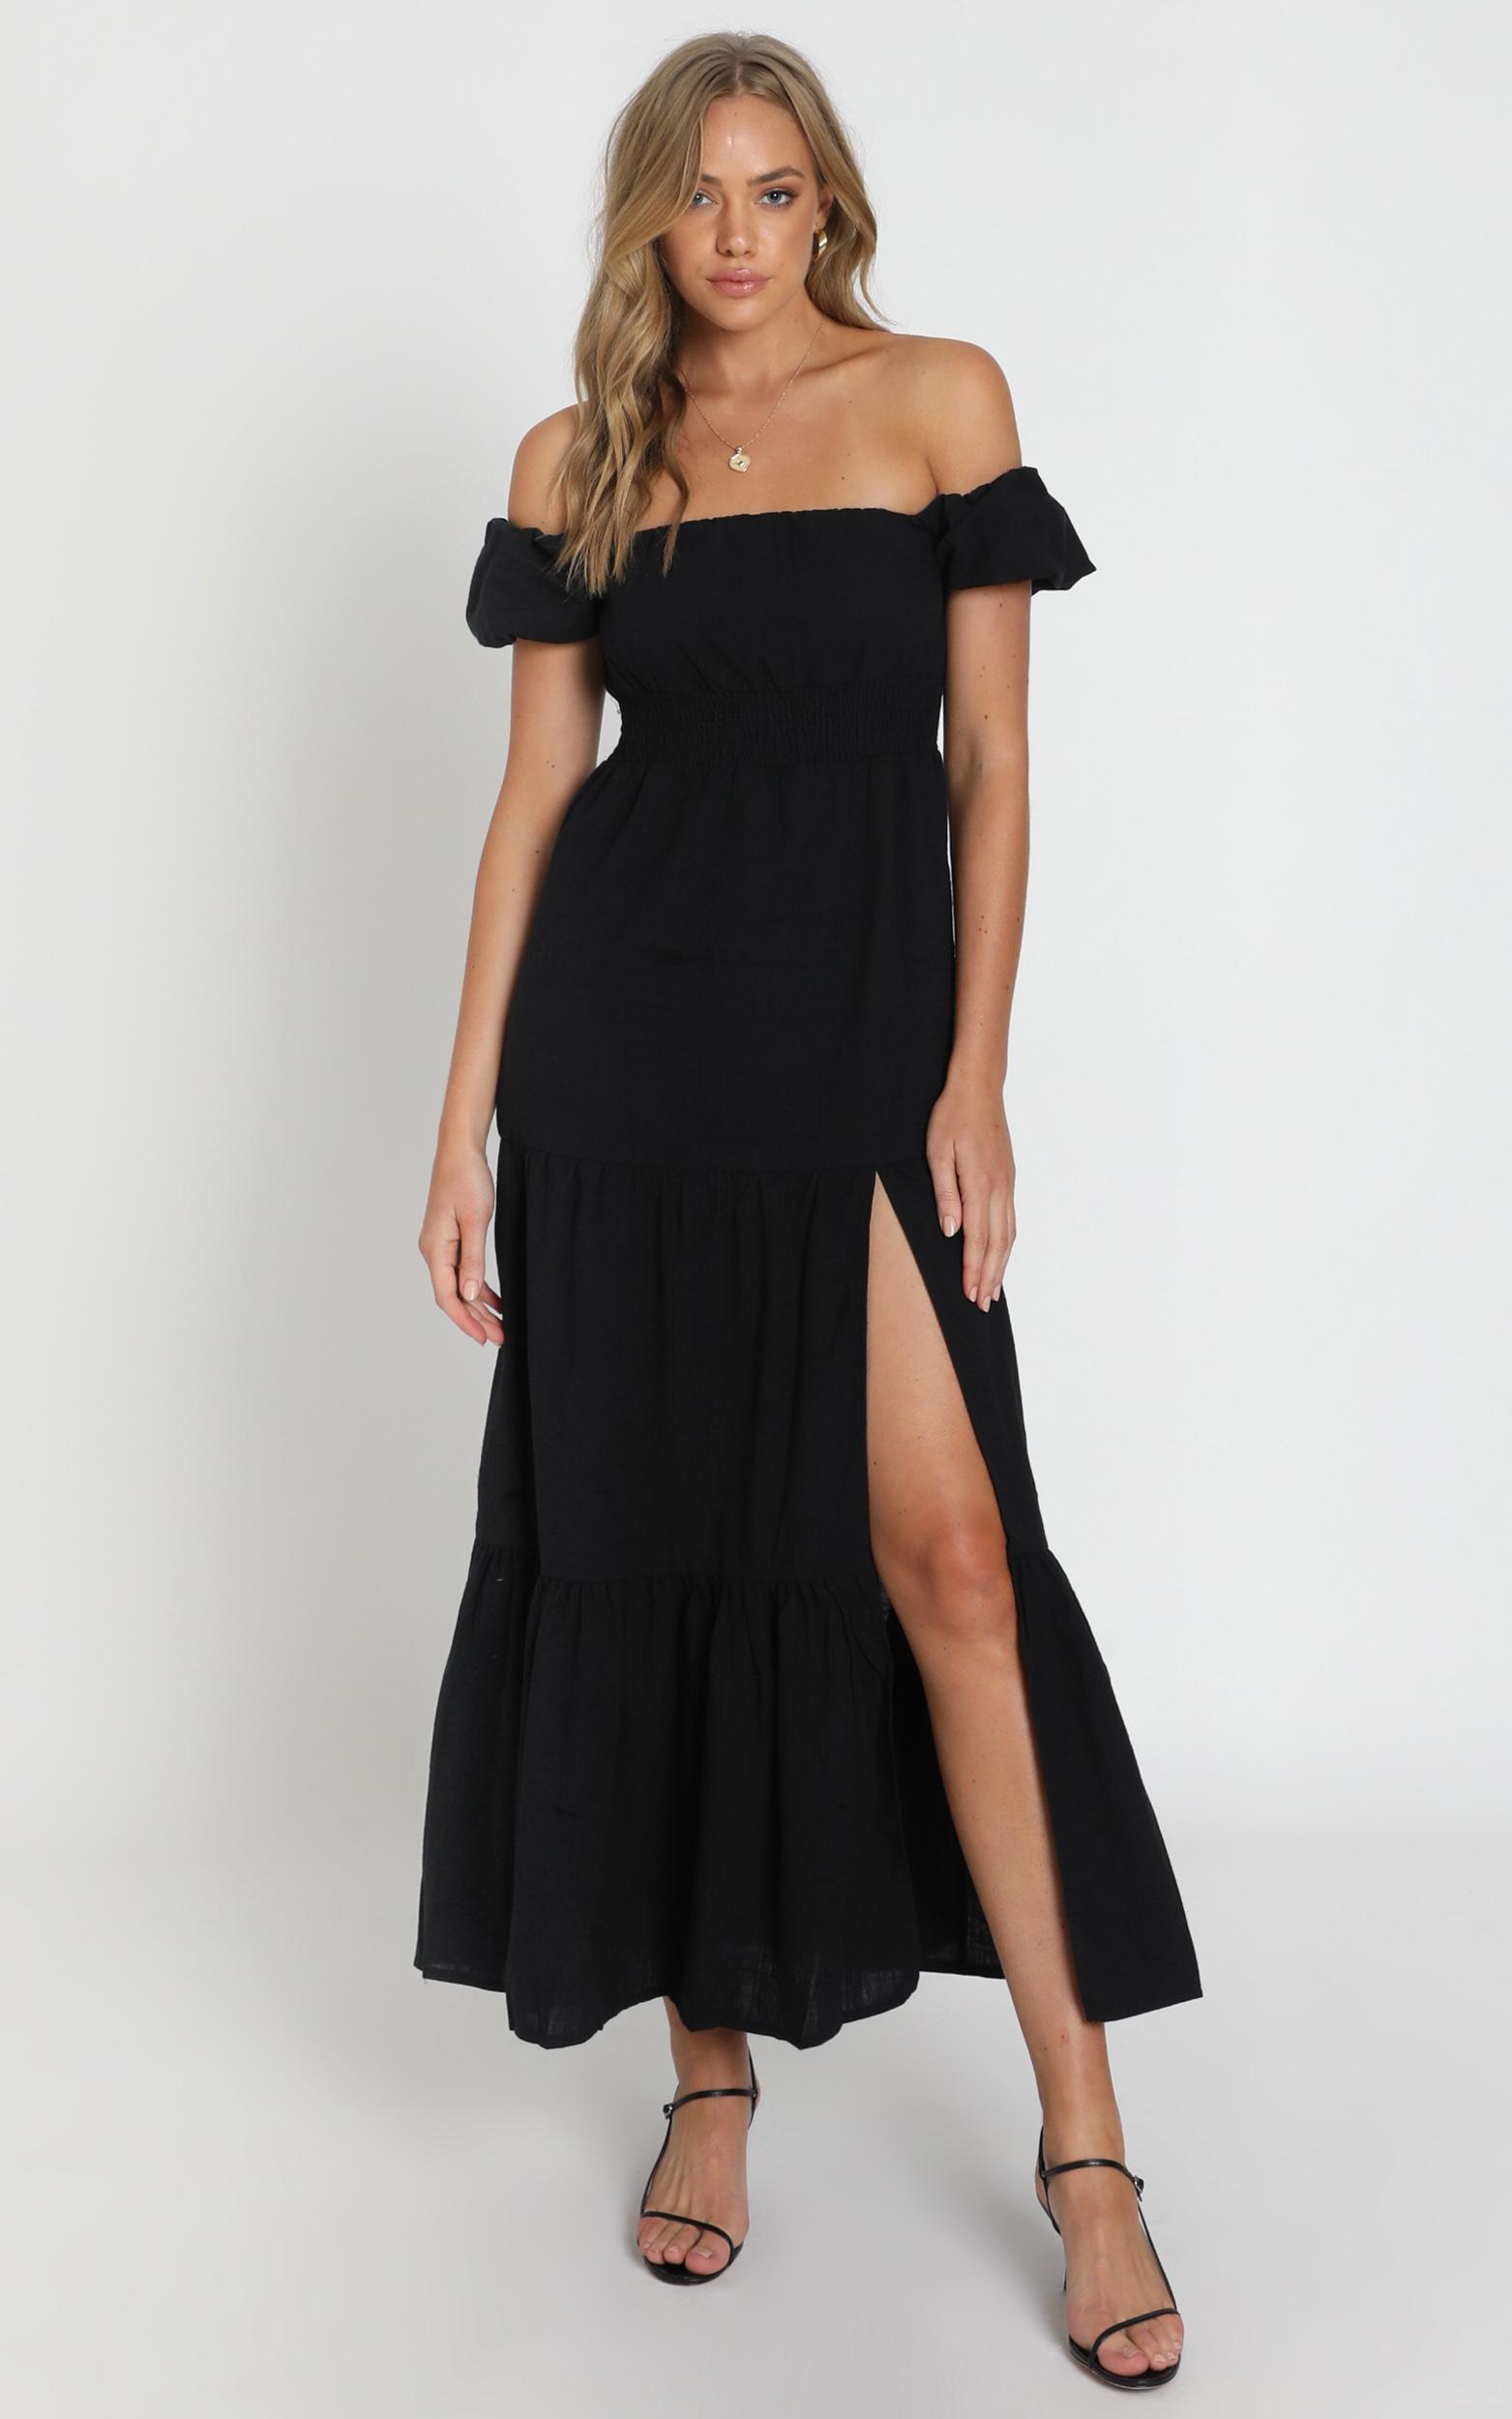 Island Hopper Dress in black - 20 (XXXXL), Black, hi-res image number null